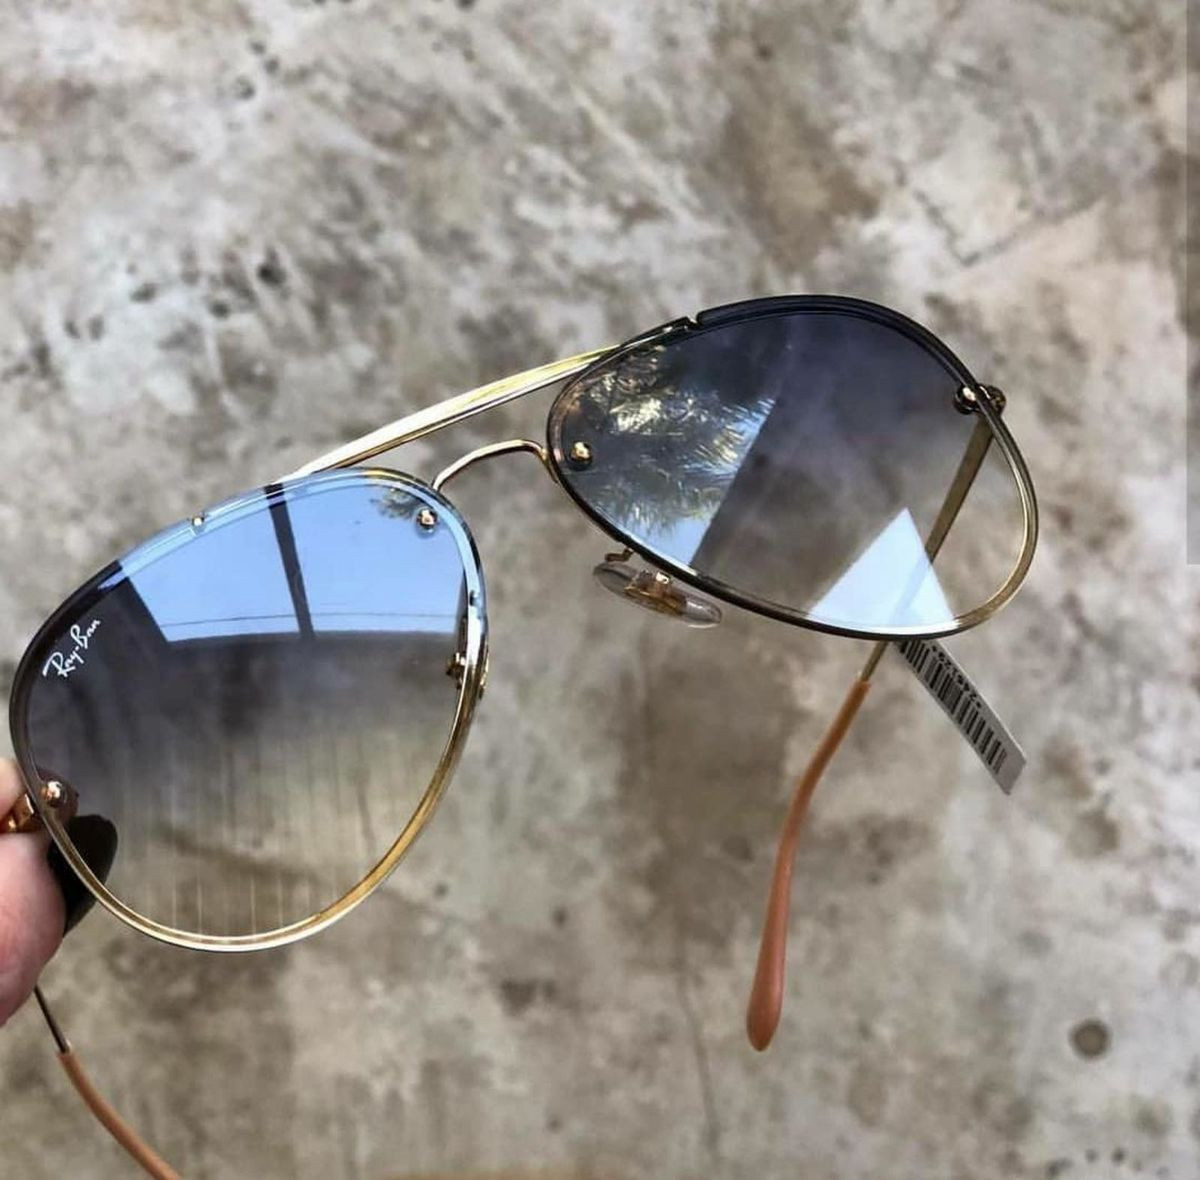 aviador blaze azul degrade - óculos ray-ban.  Czm6ly9wag90b3muzw5qb2vplmnvbs5ici9wcm9kdwn0cy81mtexodcvztywmdcxnjizmdnmmdlkyzbhyjiwndrmywziodu5nwiuanbn  ... f1590dc783